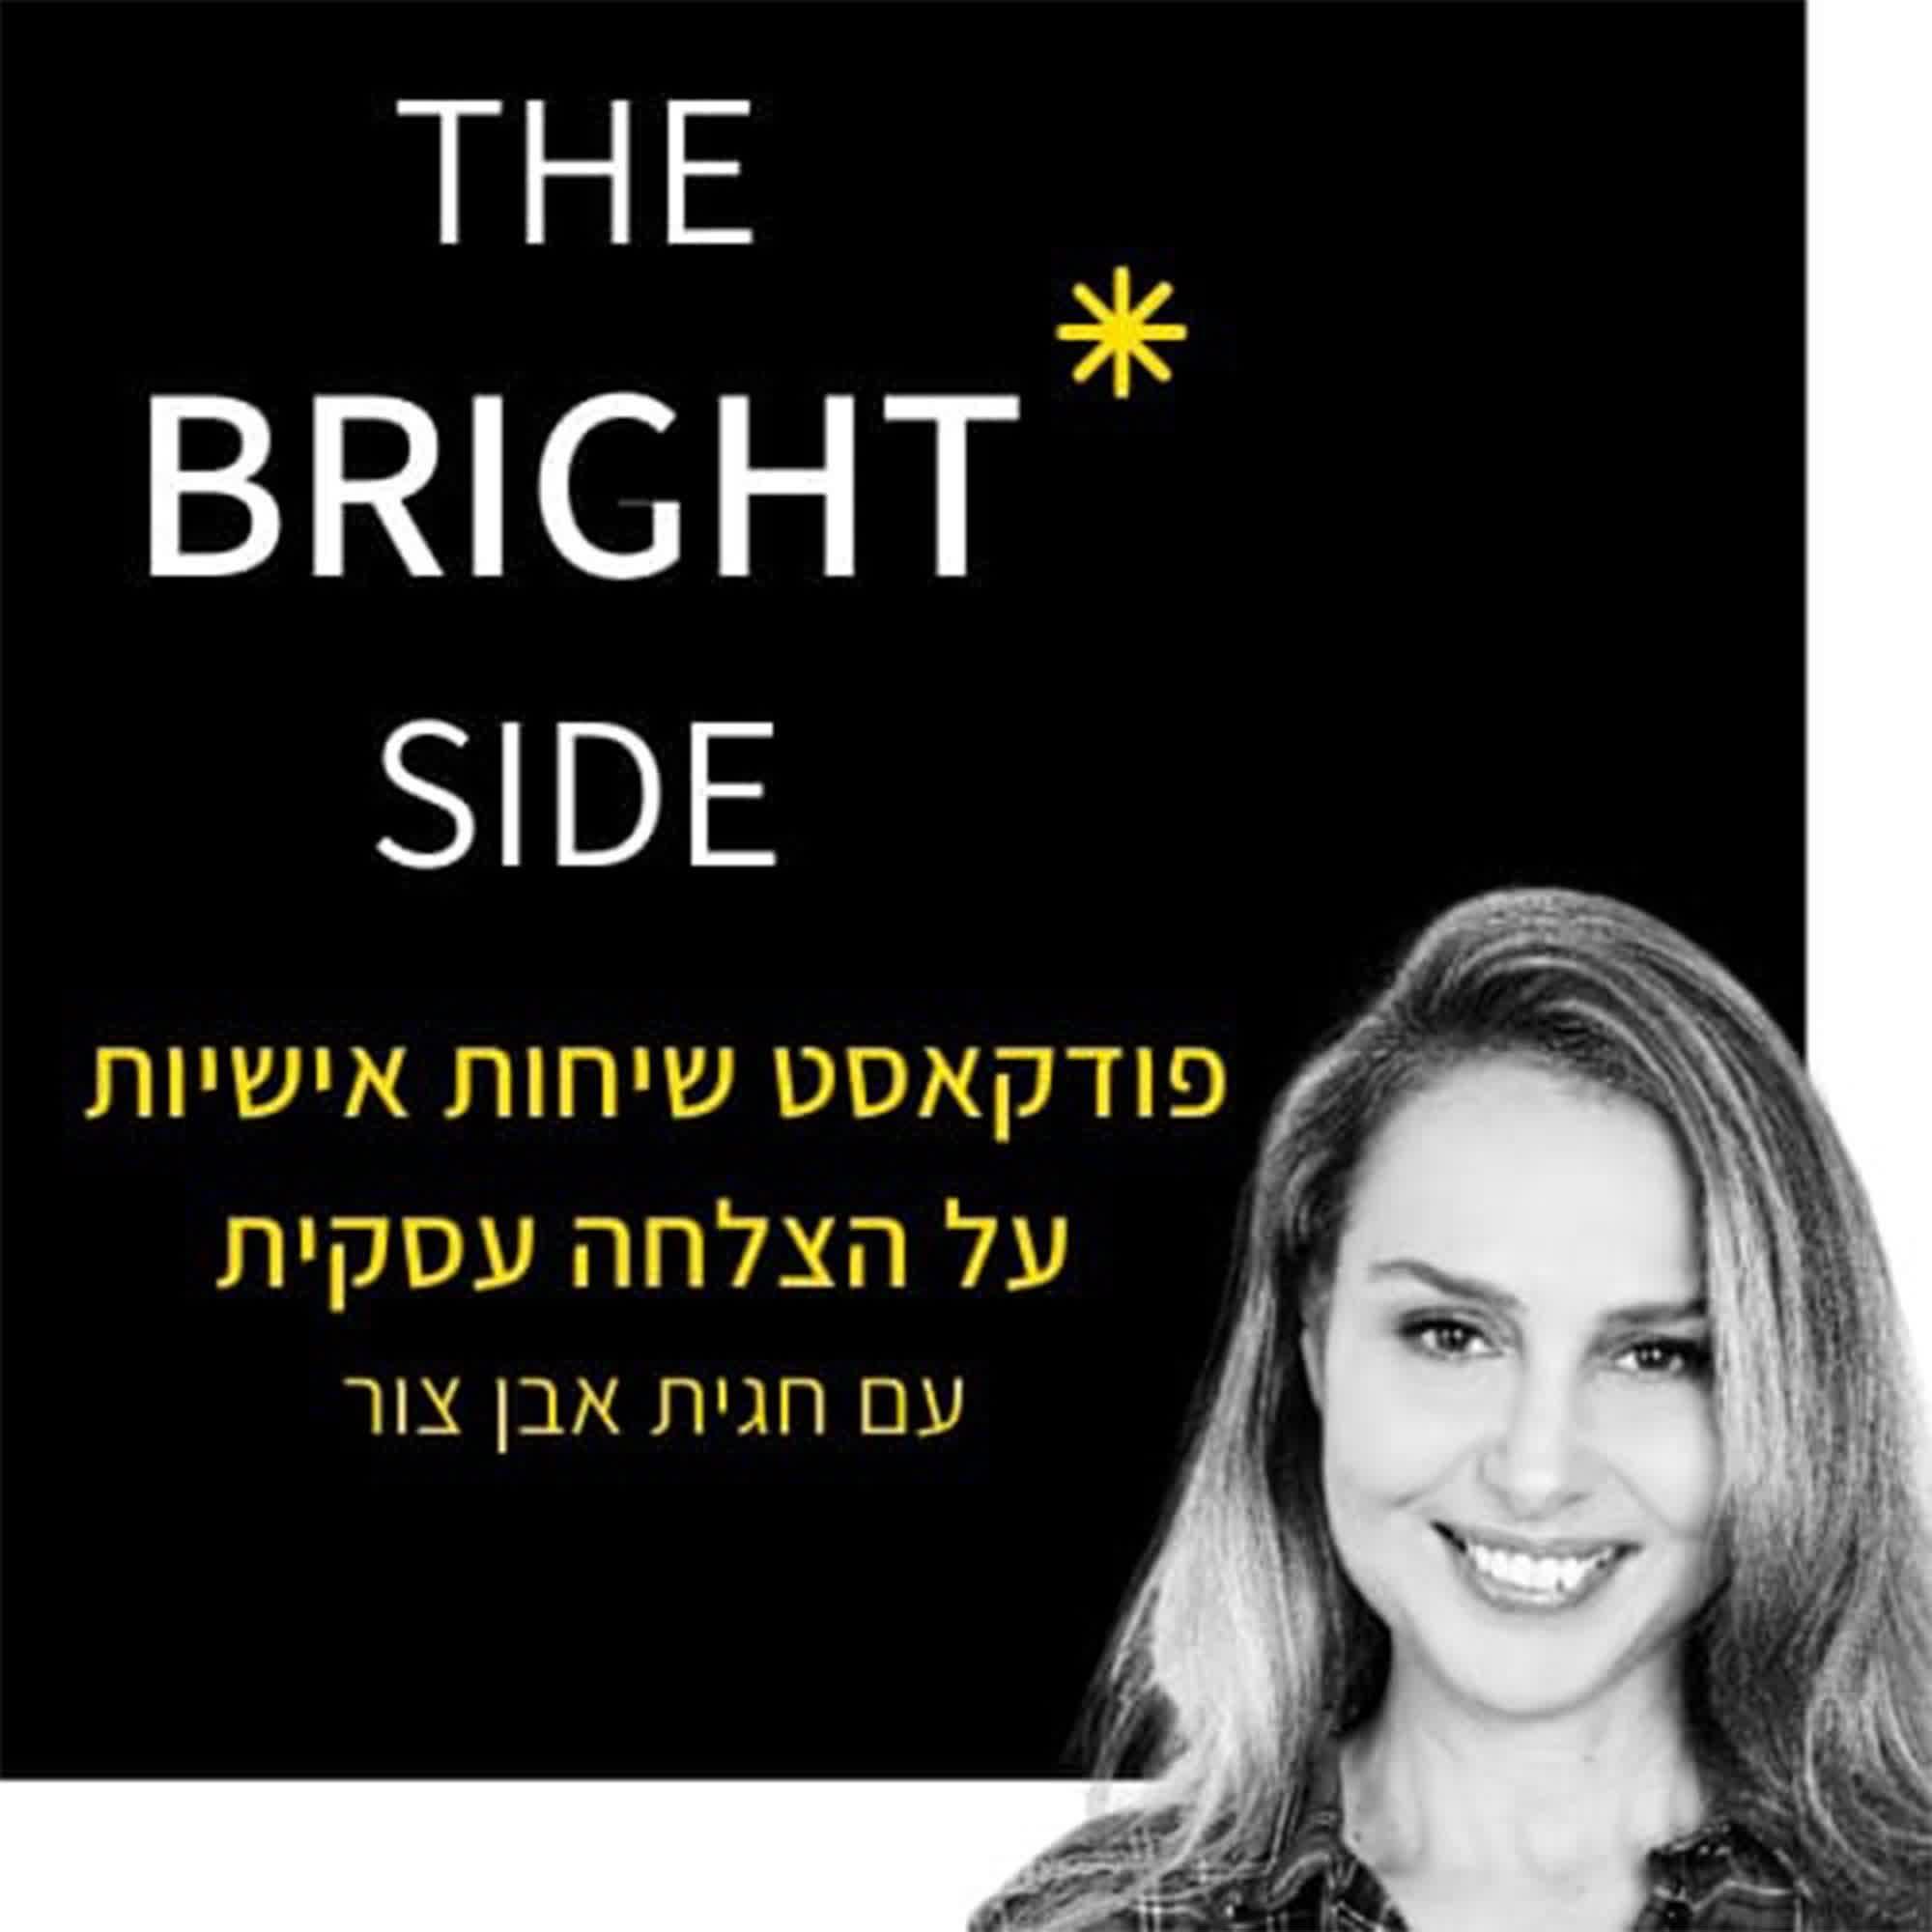 The Bright Side - שיחה אישית על הצלחה עסקית